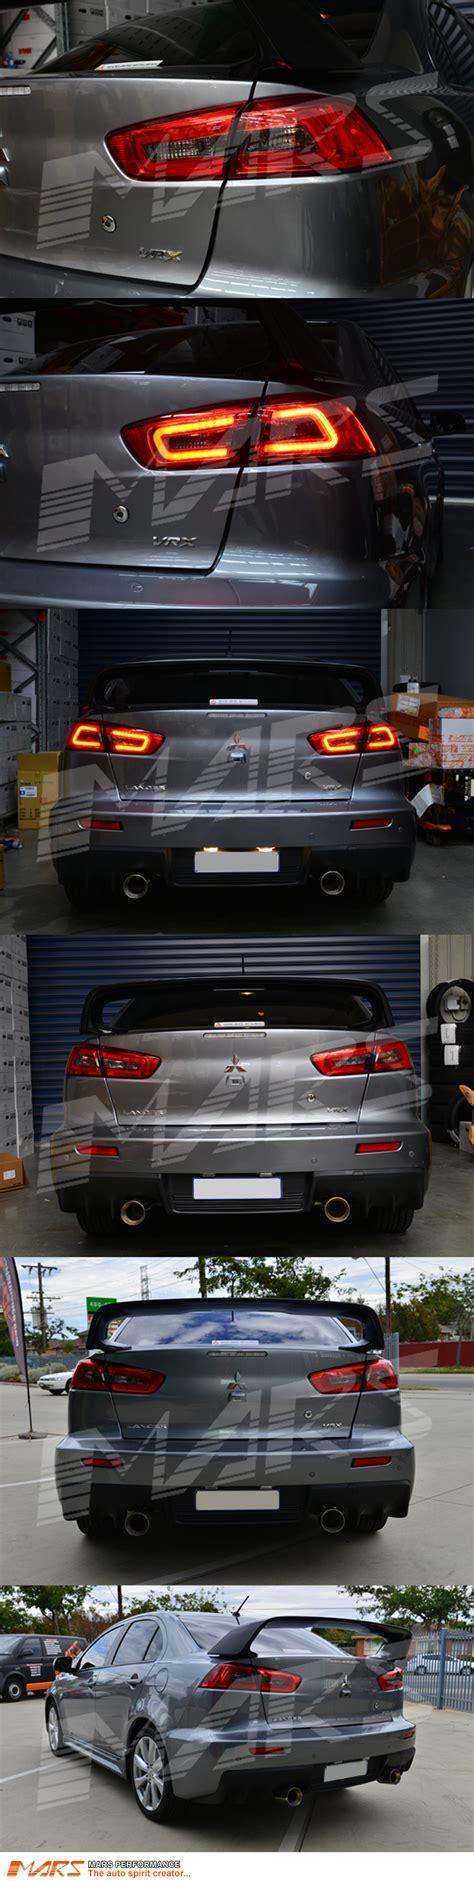 evo x tail lights jdm varis smoked red 3d led tail lights for mitsubishi